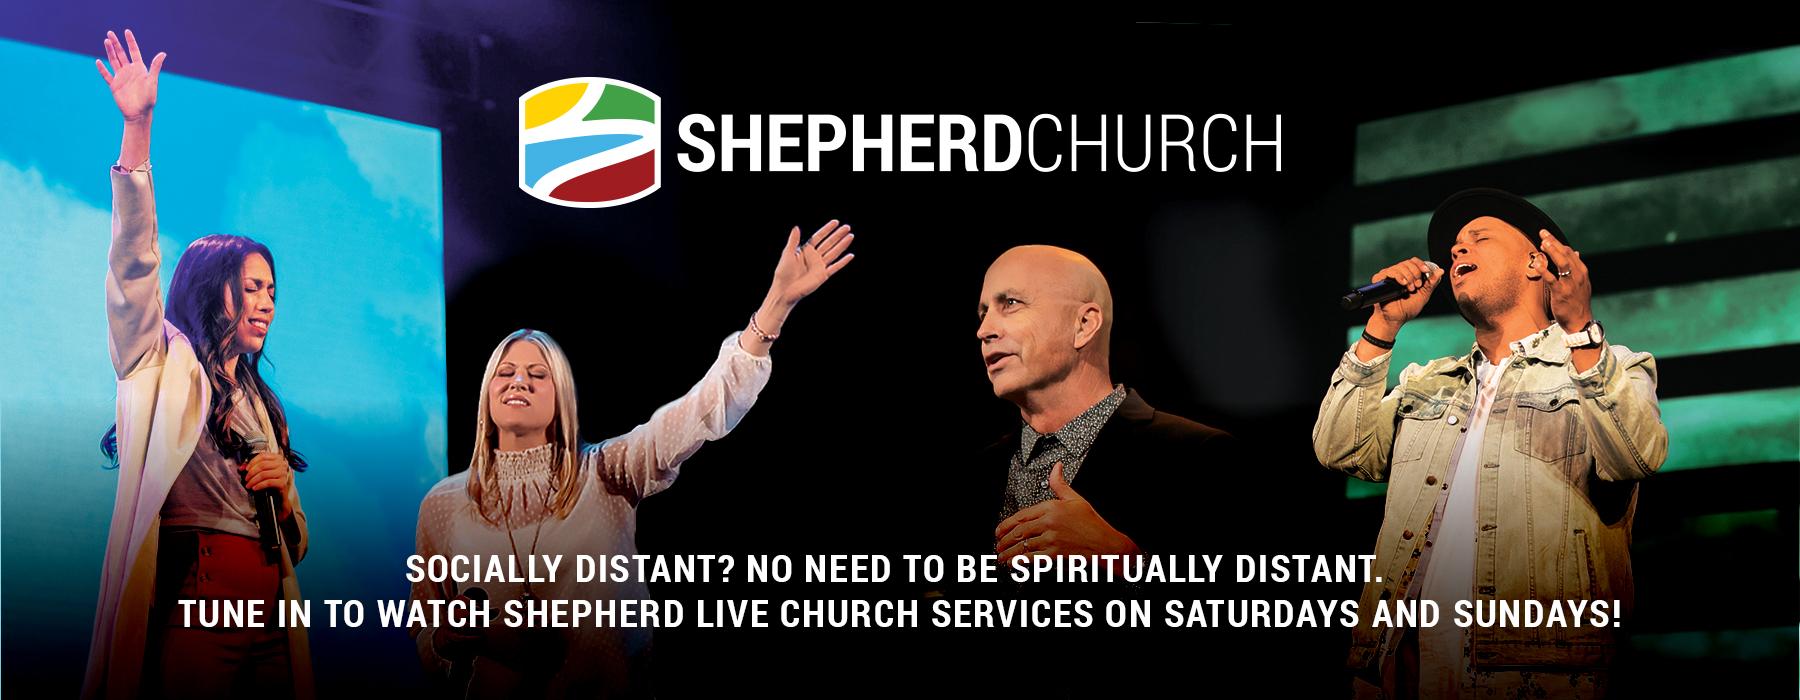 LUJ-Rotator_Shepherd-Church-Socially-Distant-1800x700-1